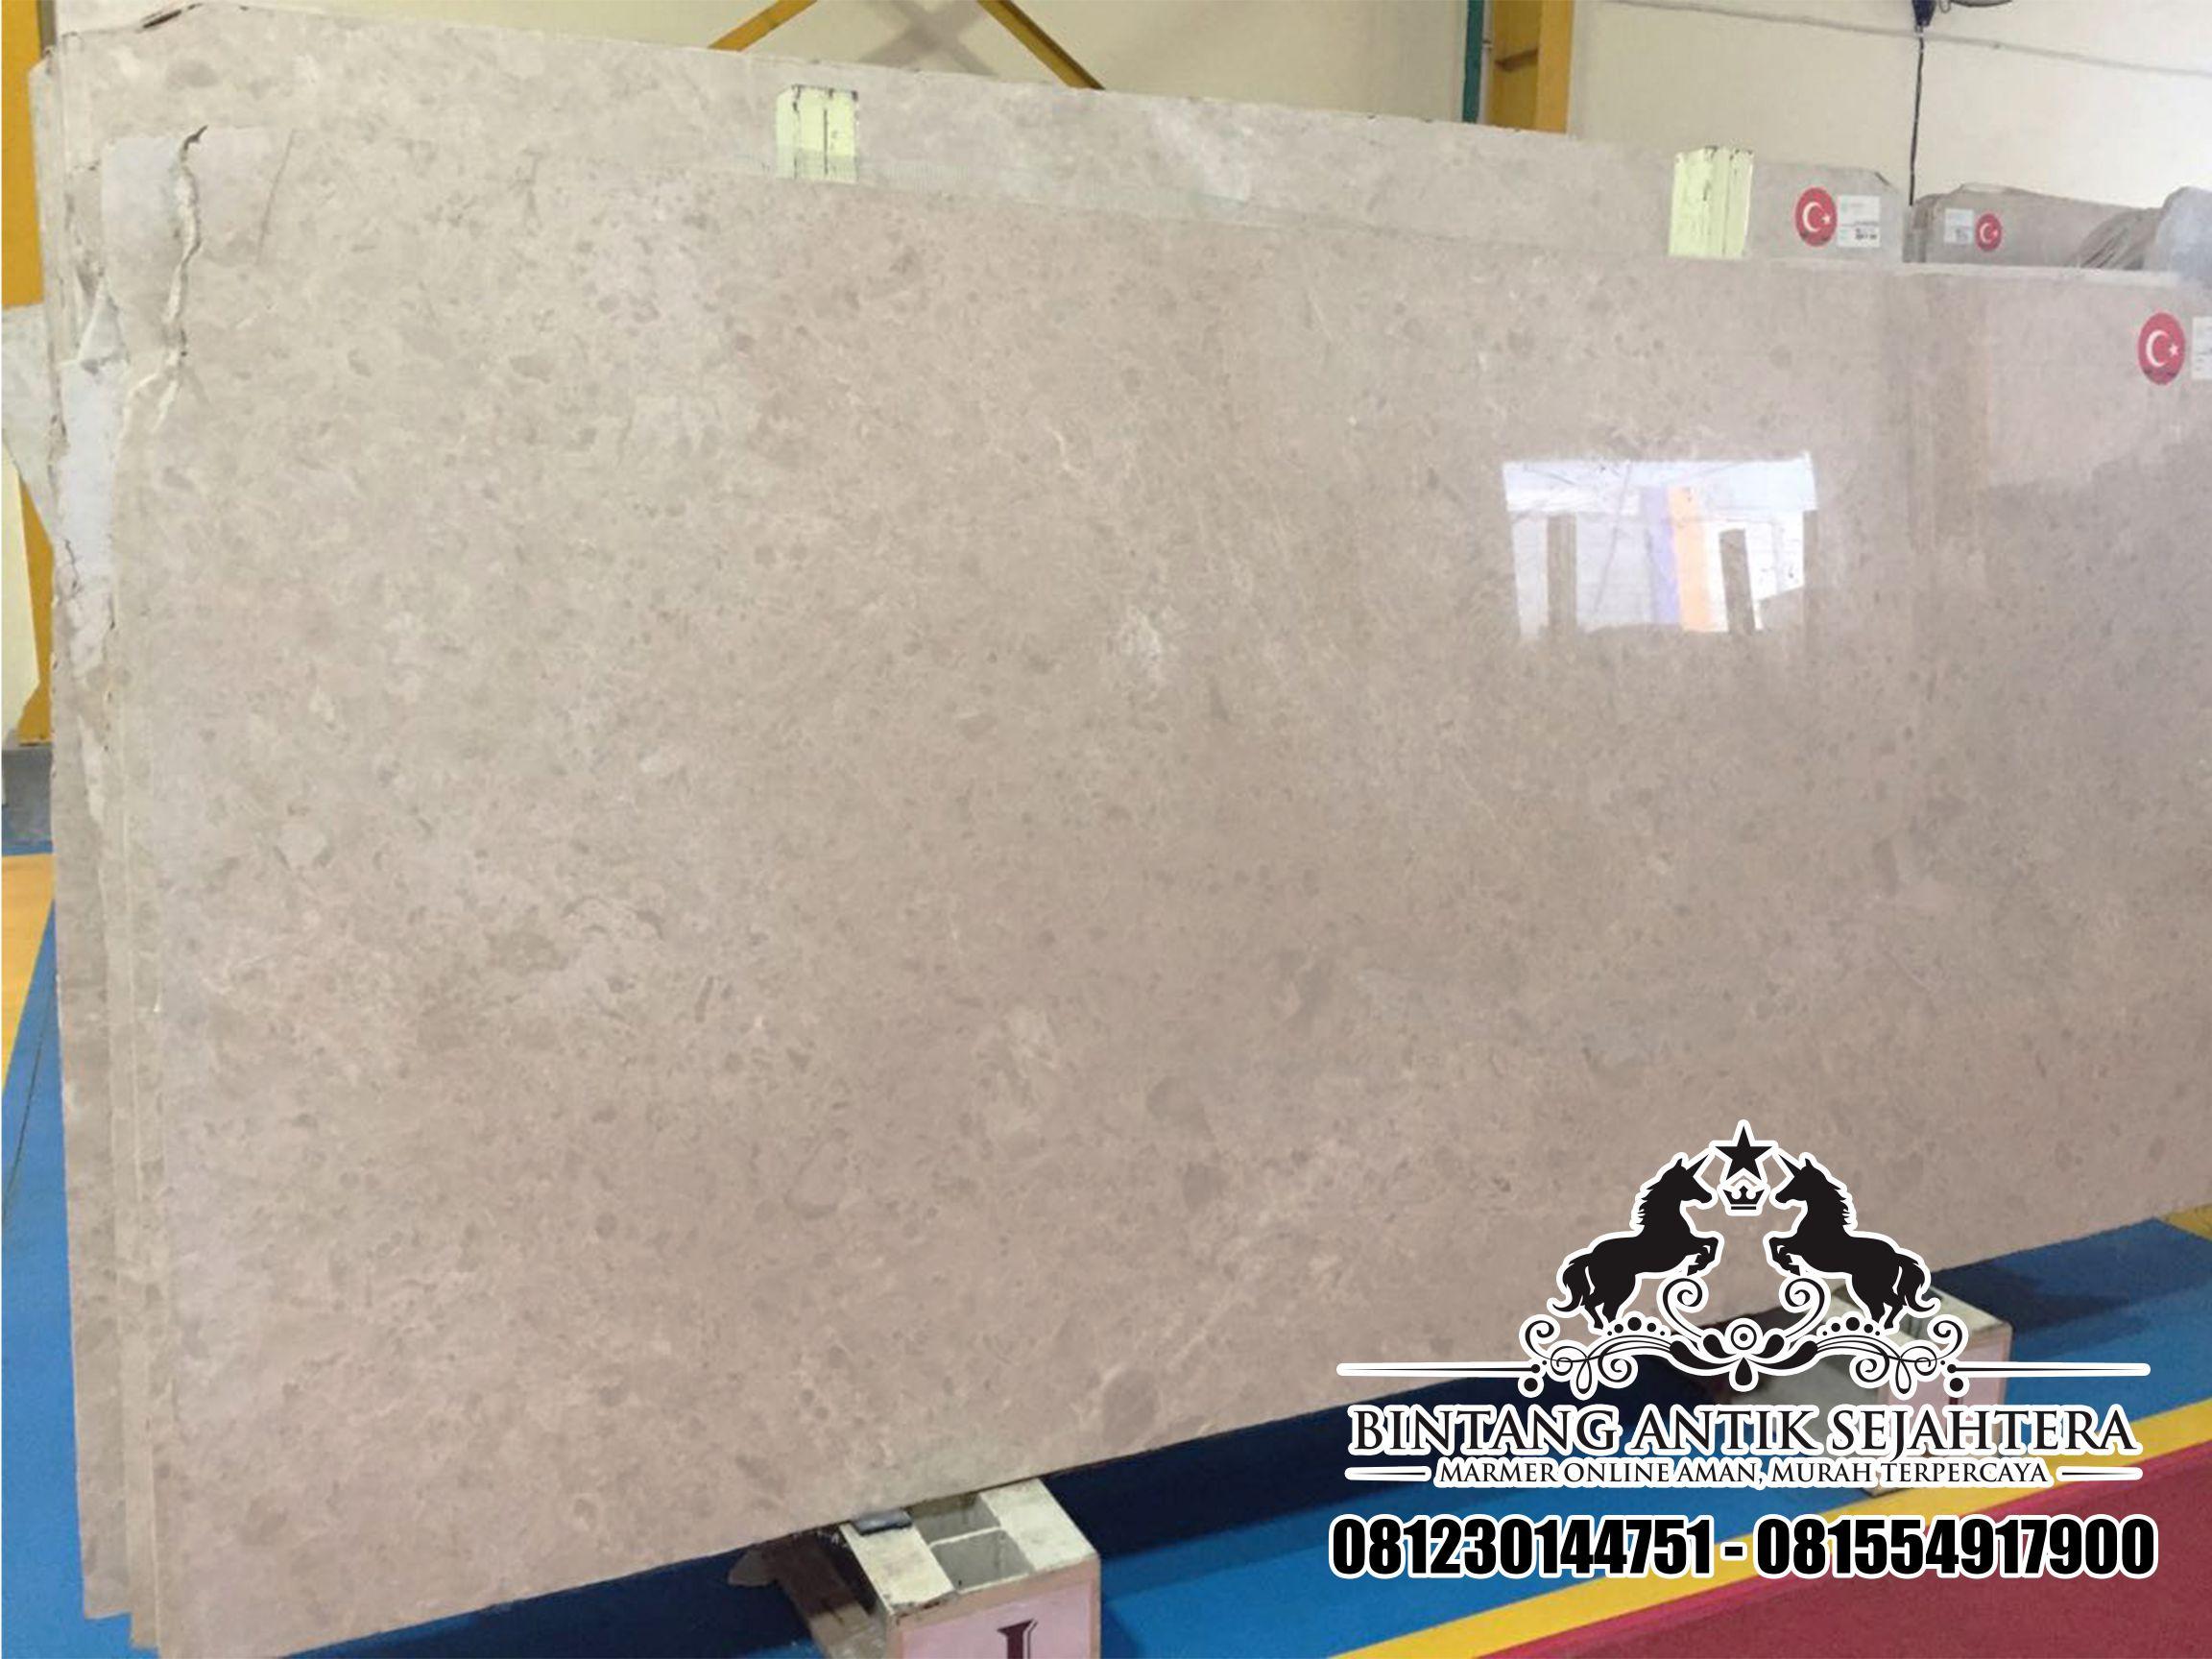 Marble Lantai | Harga Marble Lantai